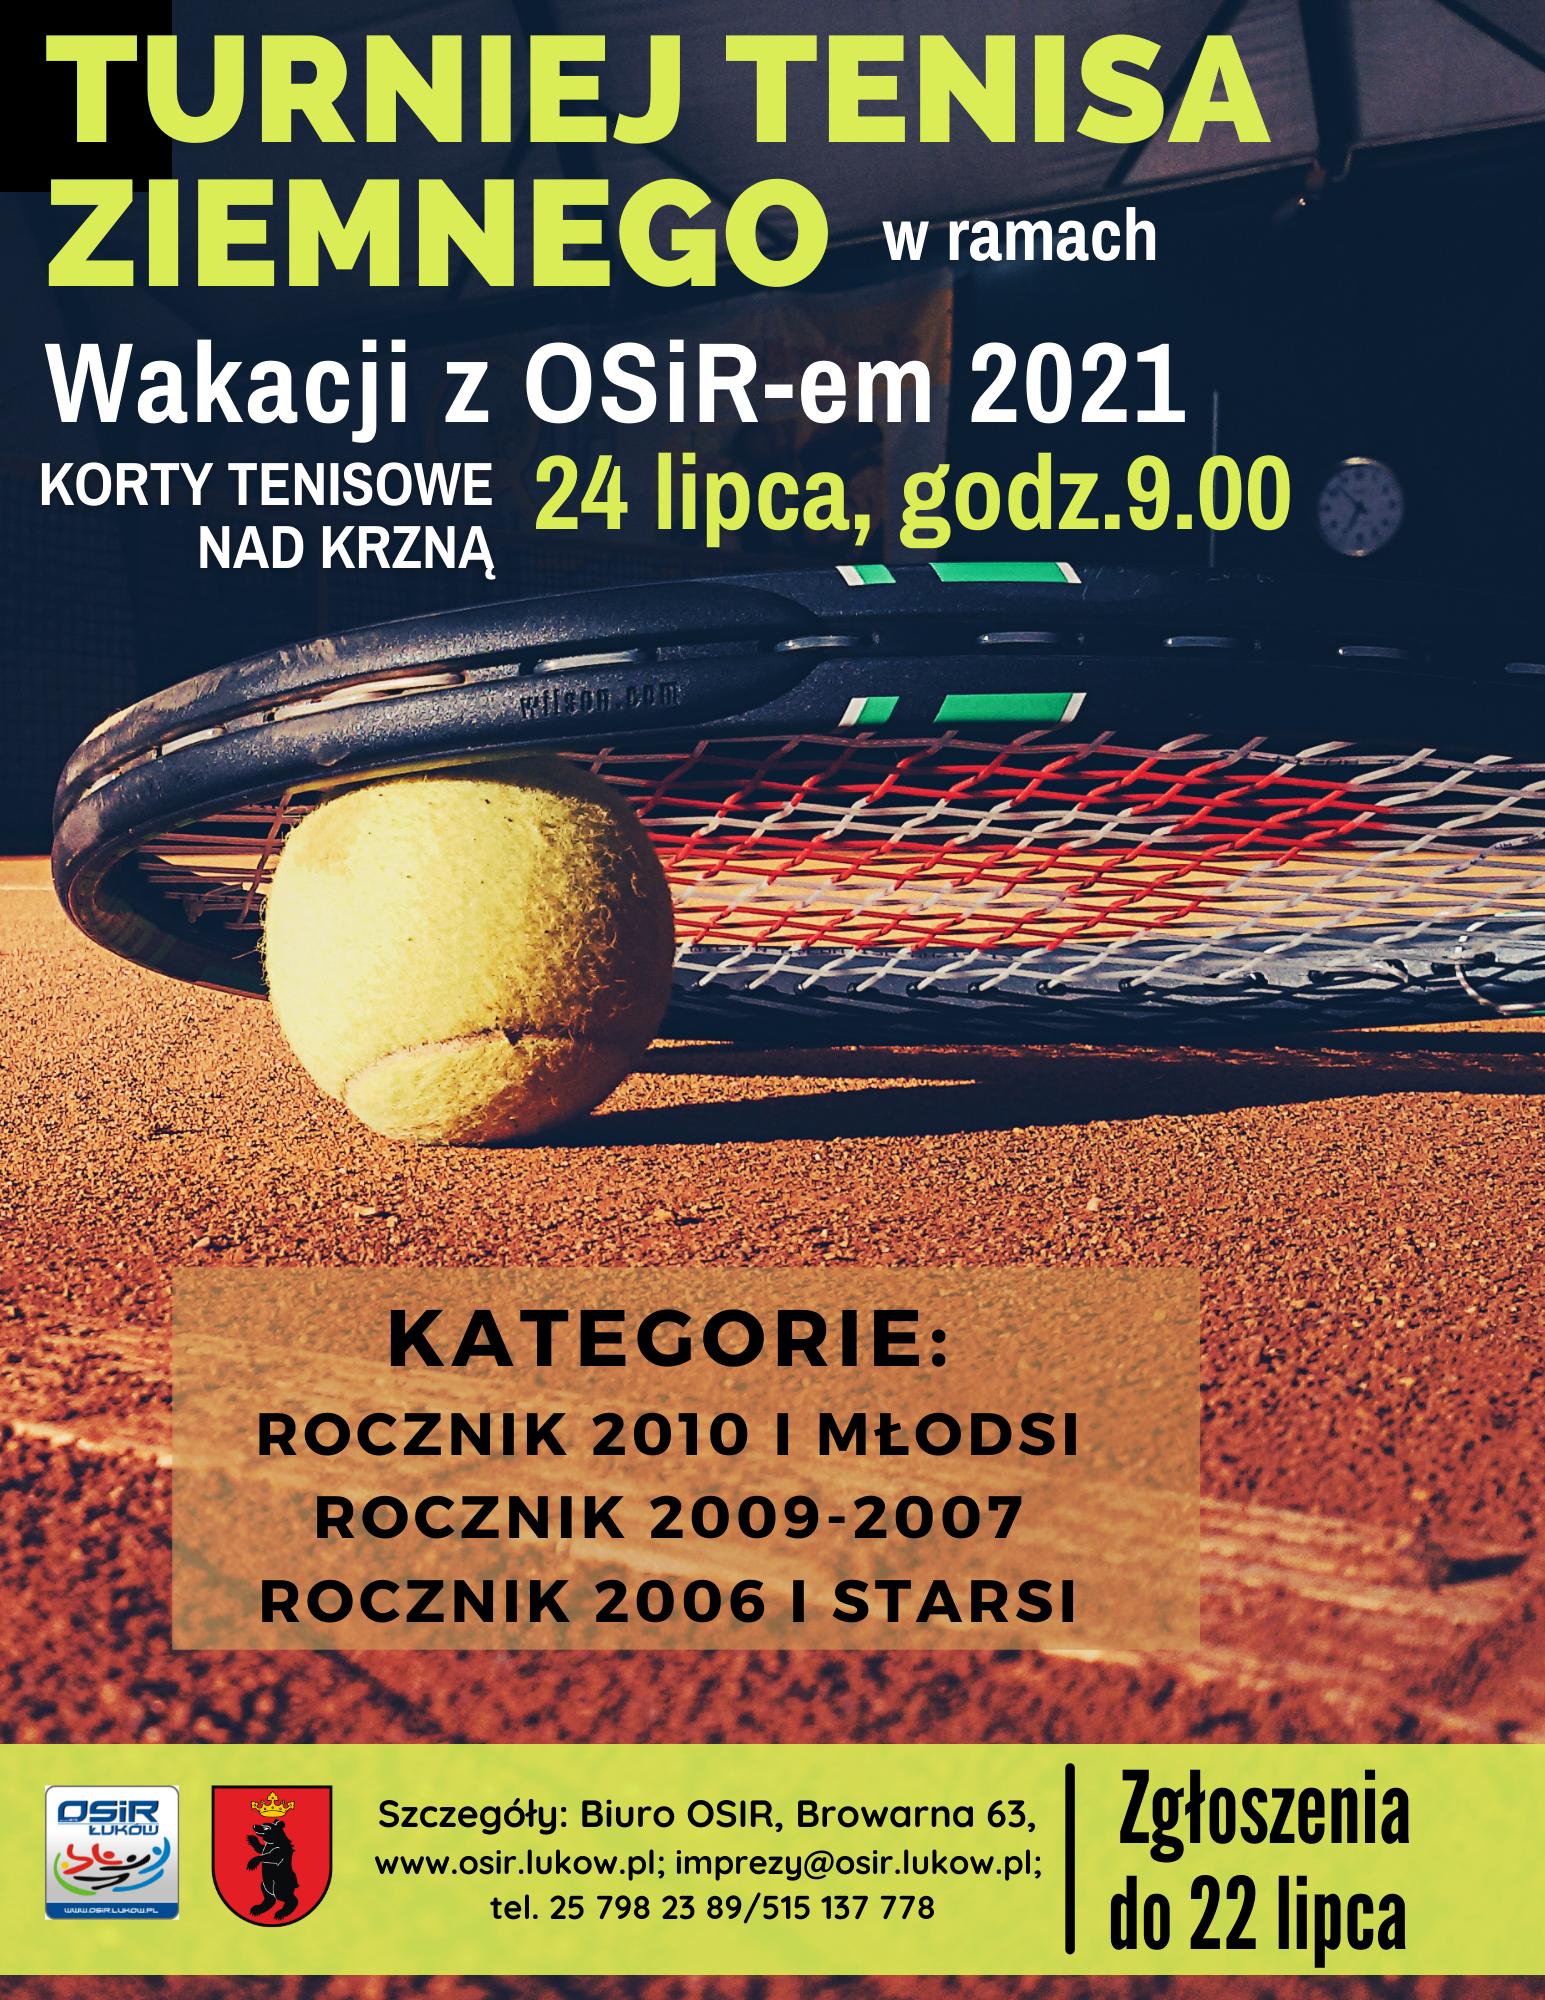 tenis, rakieta